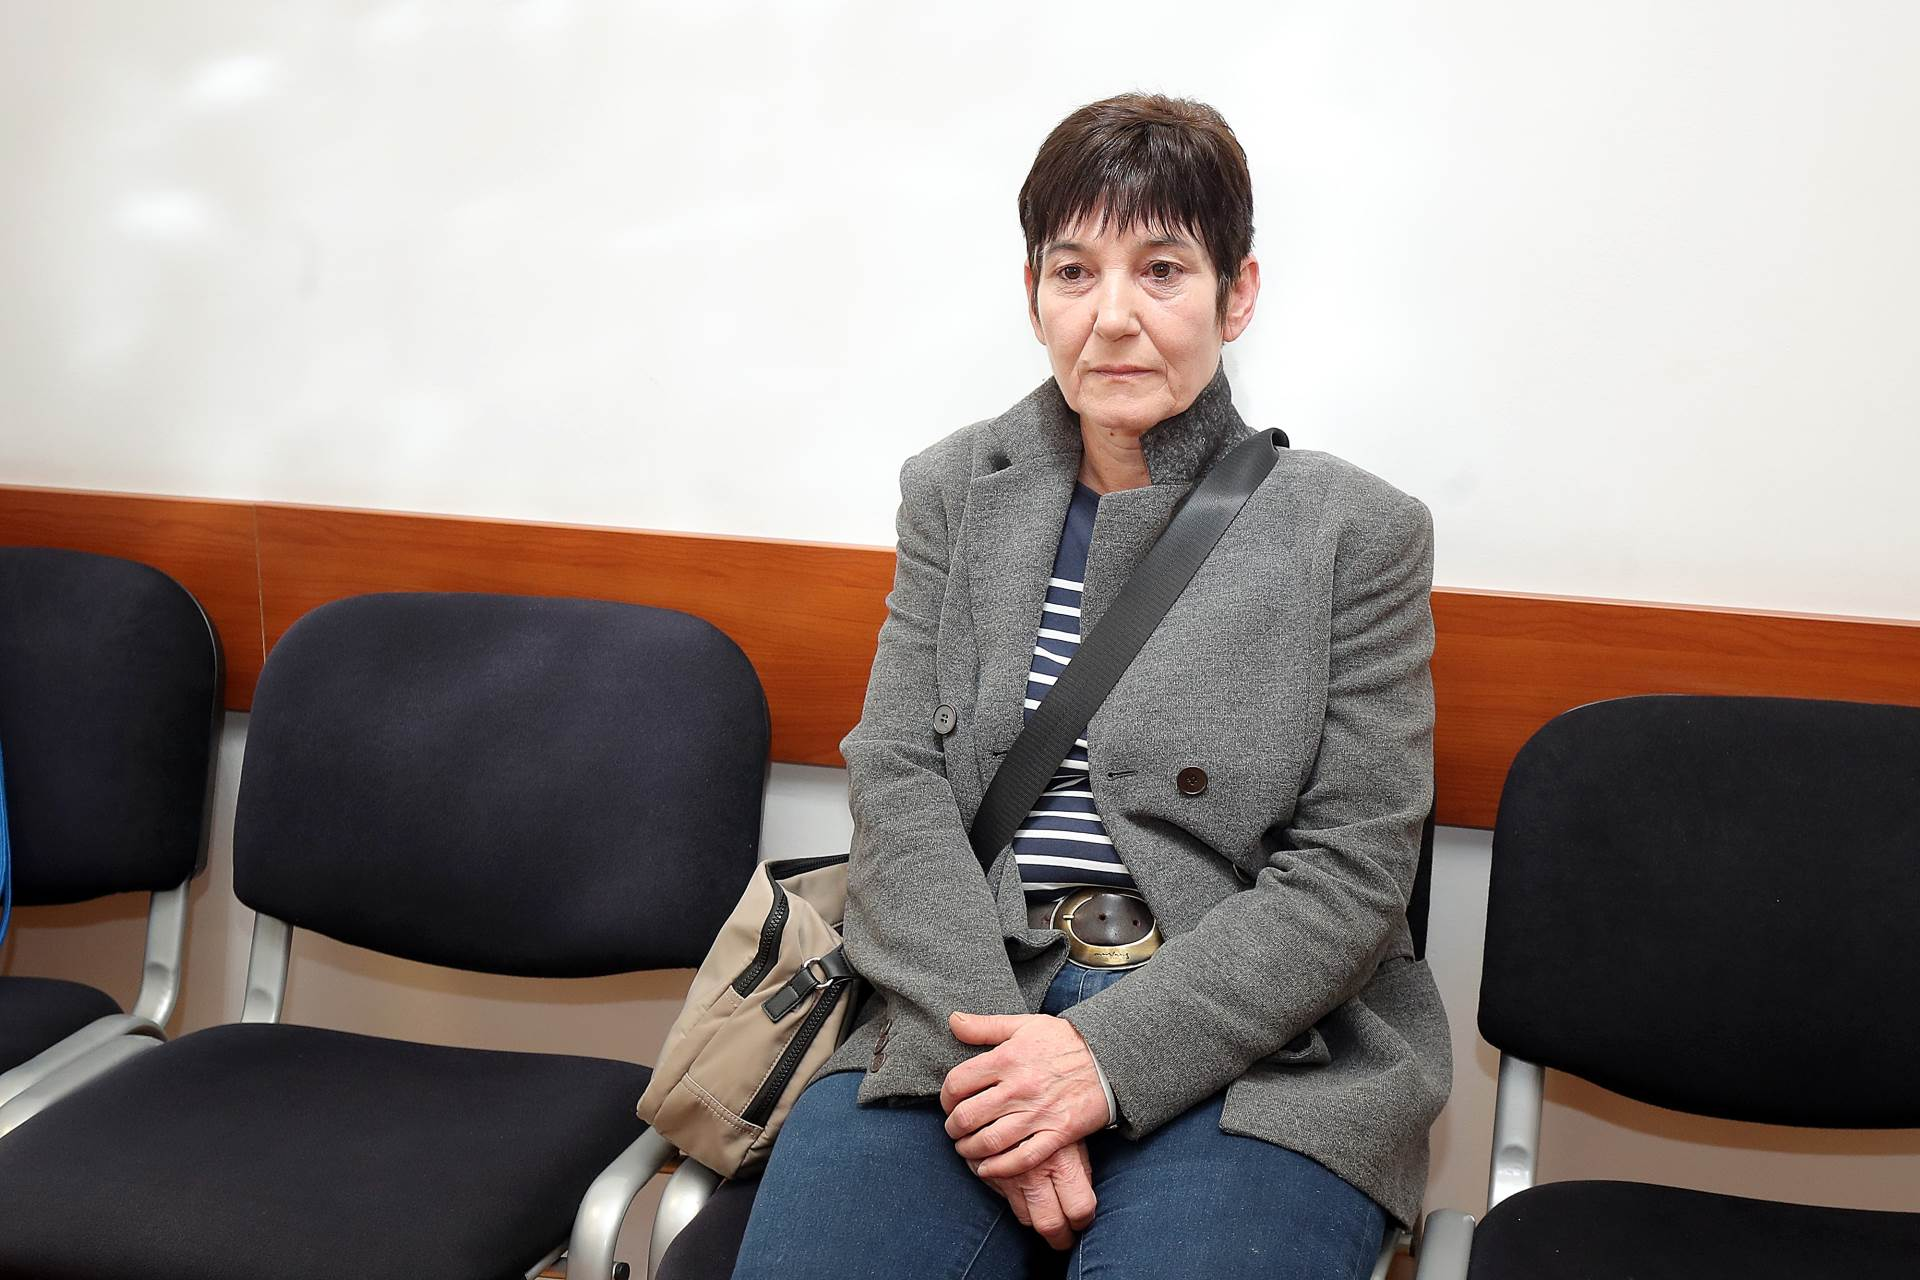 Anica Jurilj